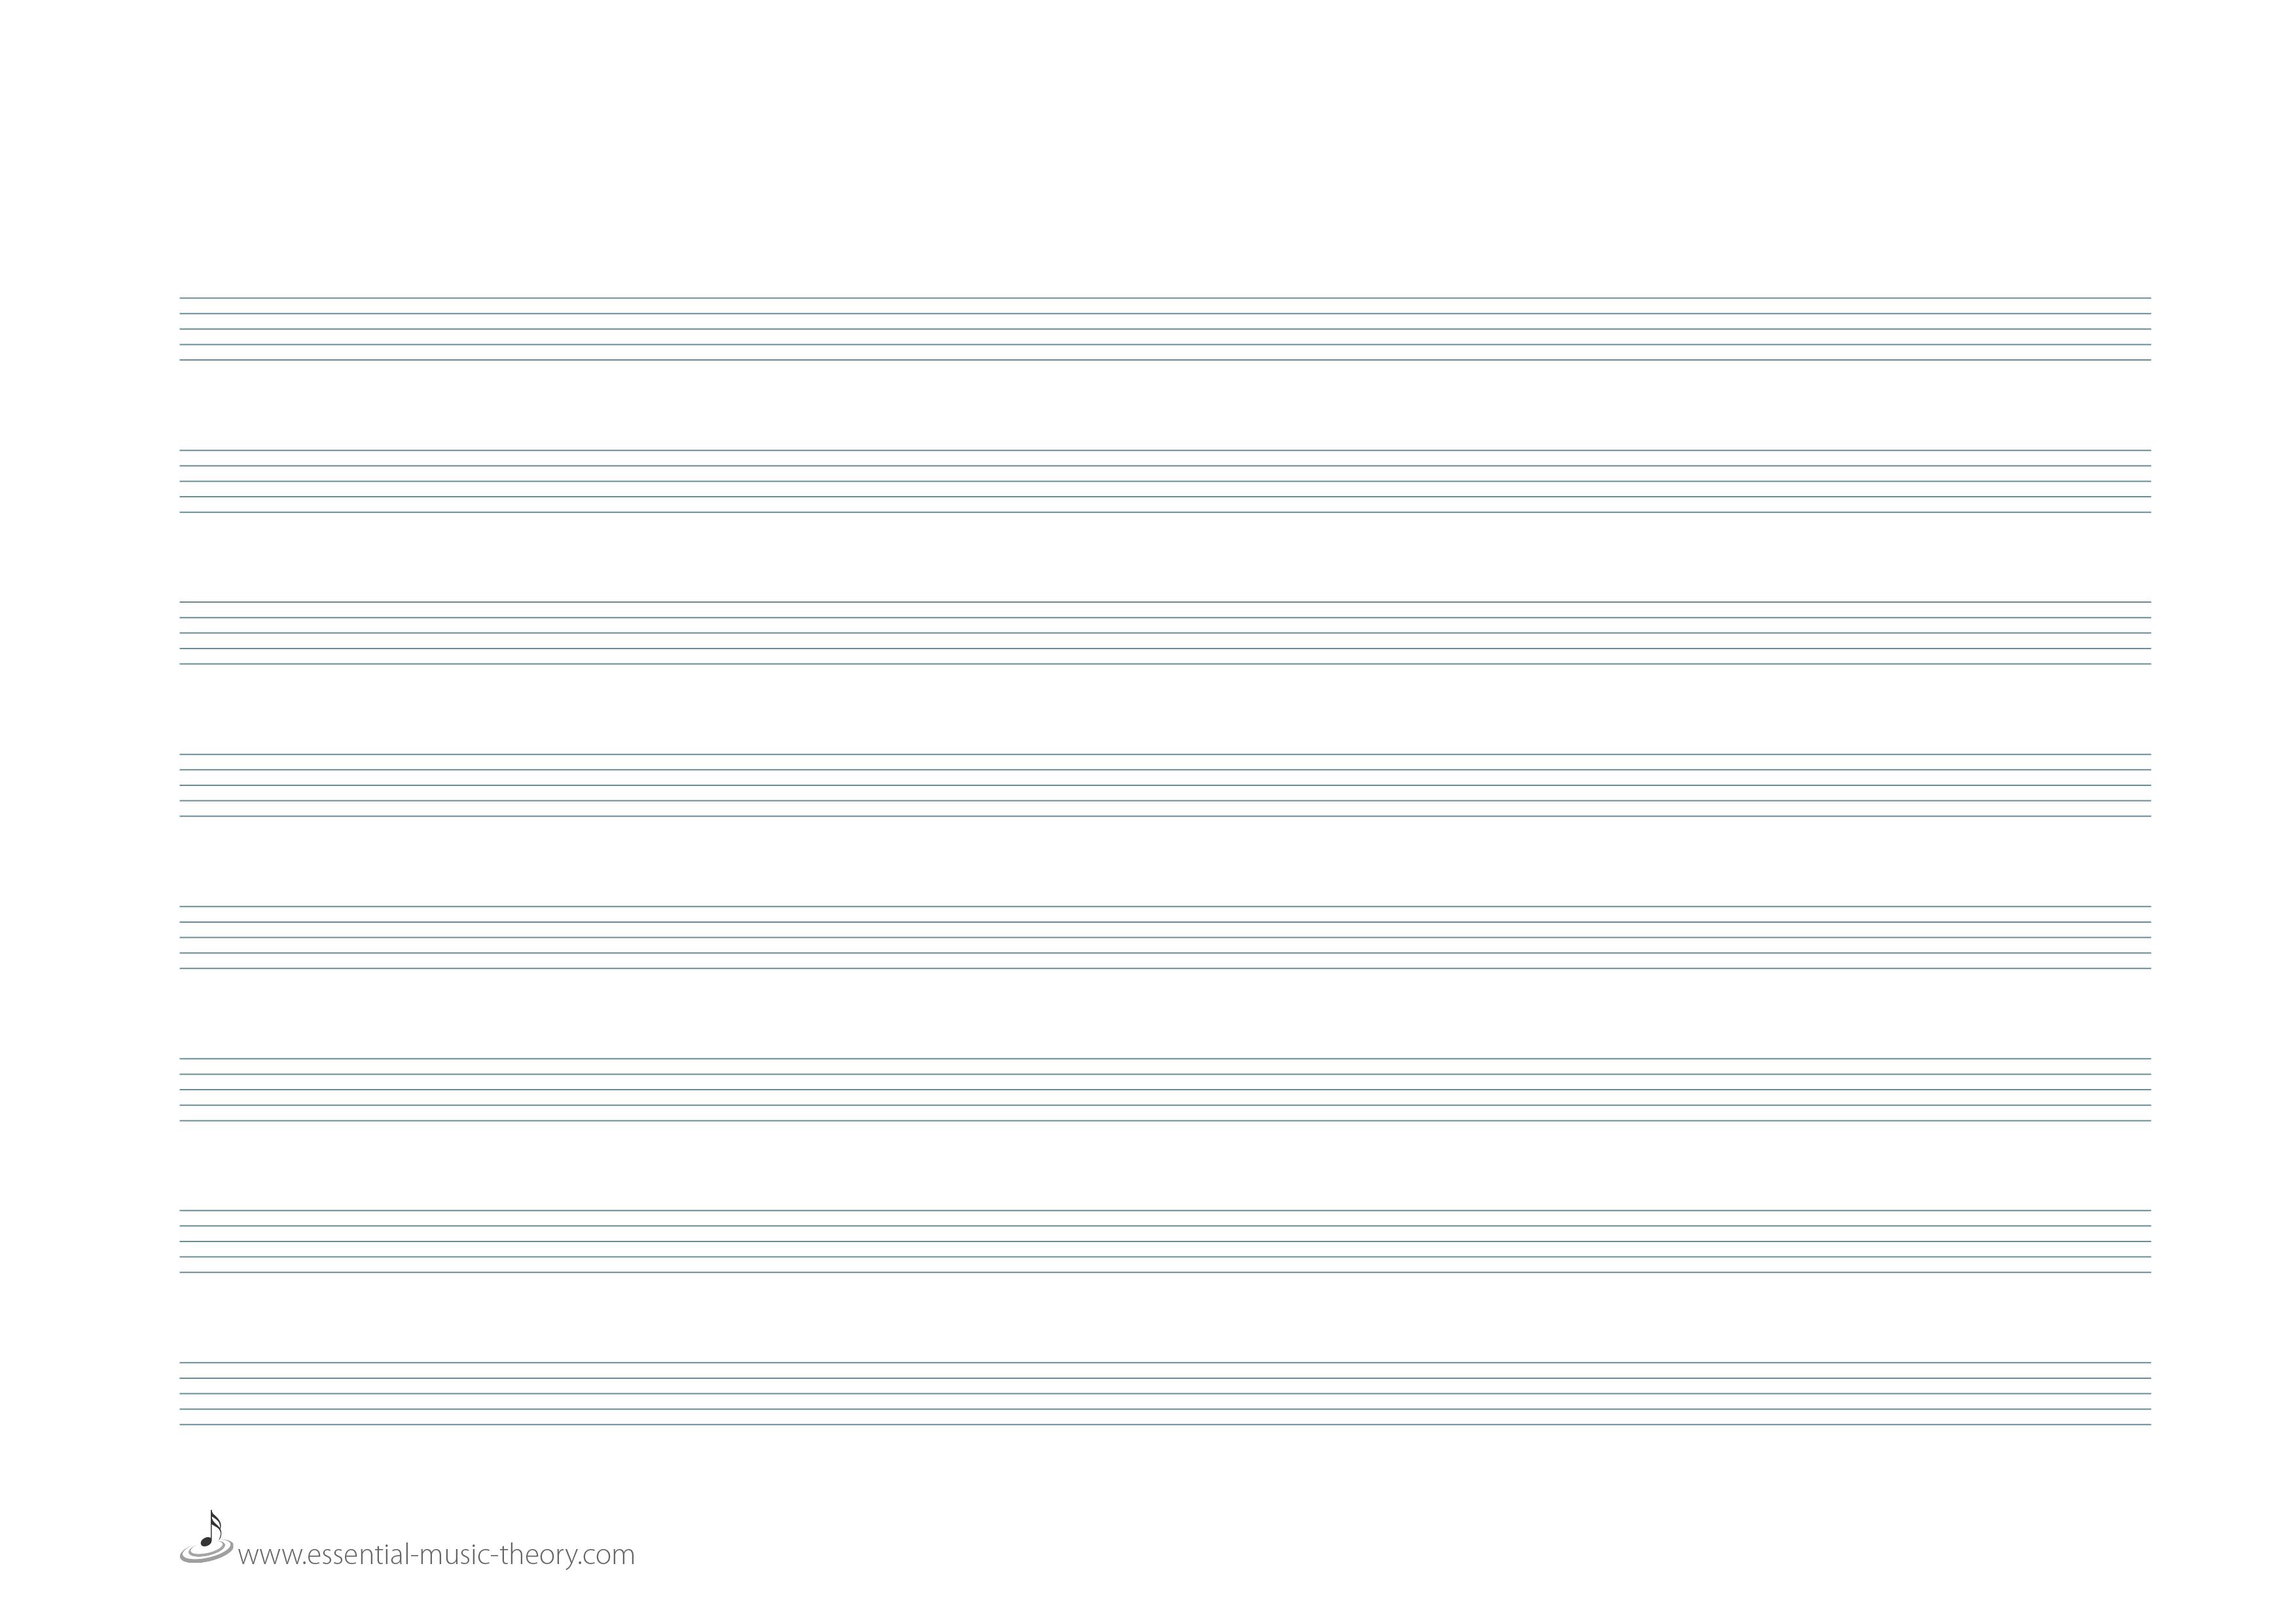 Blank Manuscript Paper - Free Printable Blank Music Staff Paper